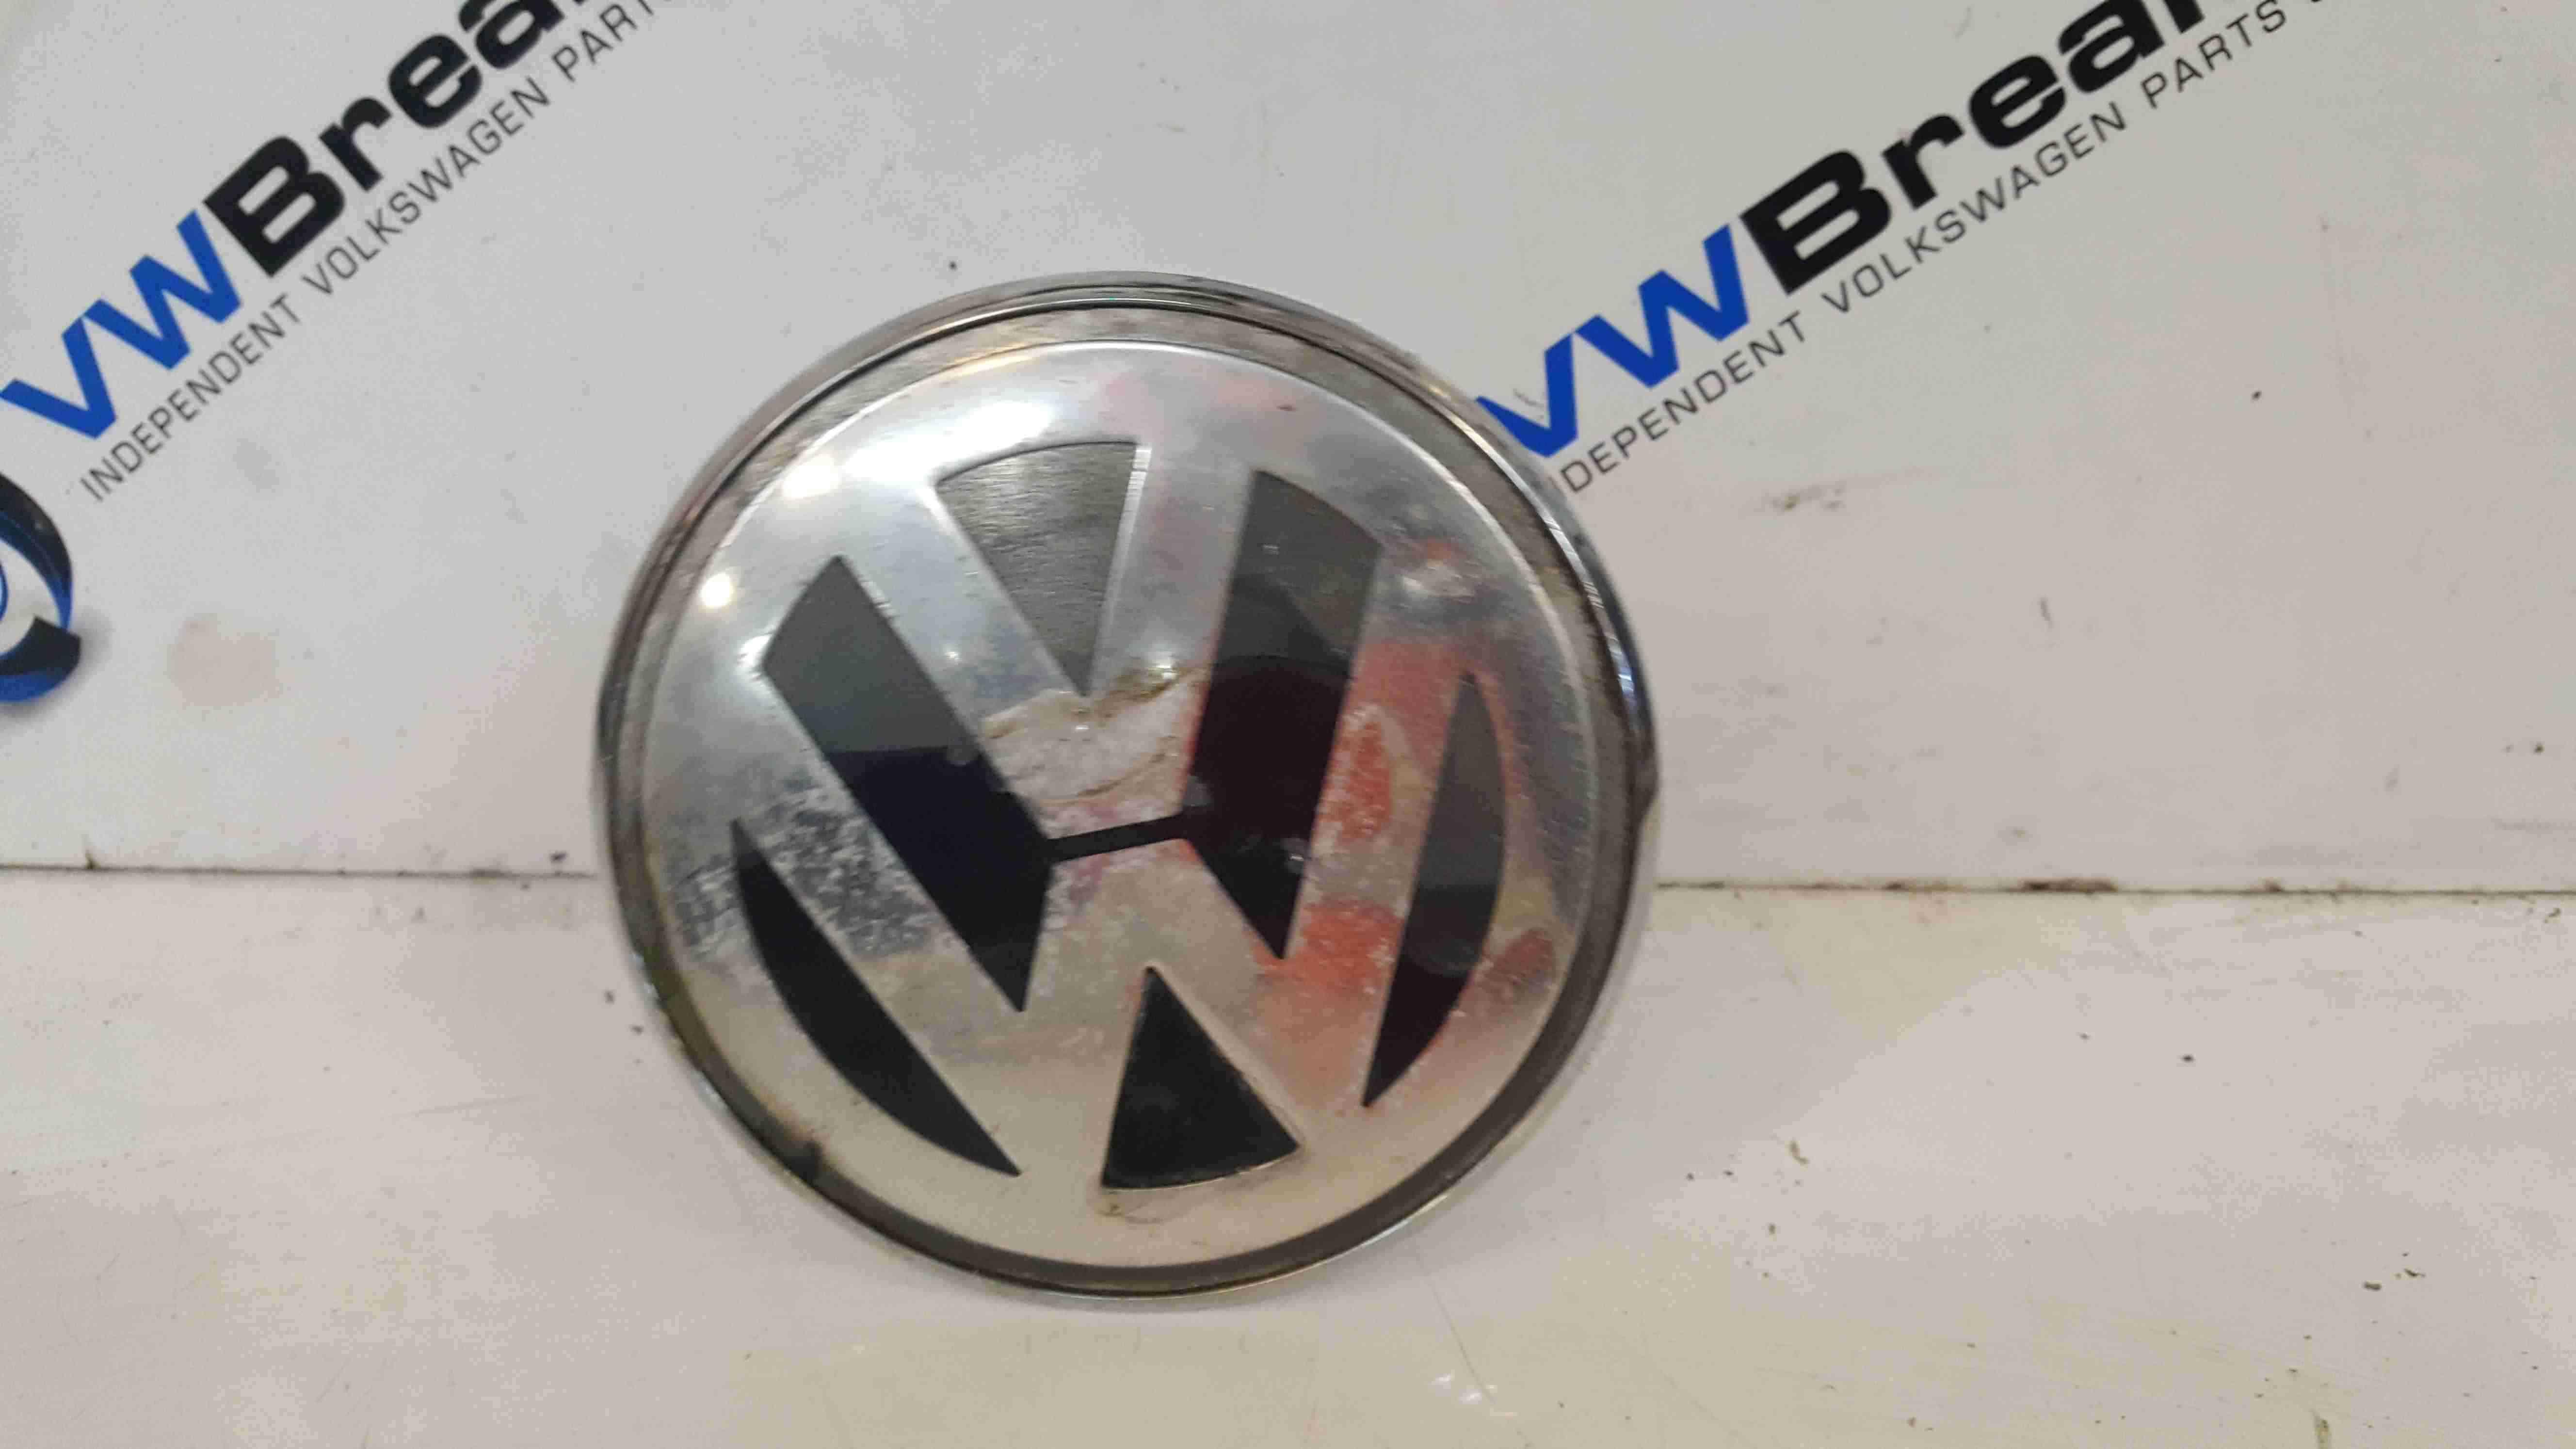 Volkswagen Beetle Convertible 2002-2006 Rear Boot Lock Badge 1Y0827469A